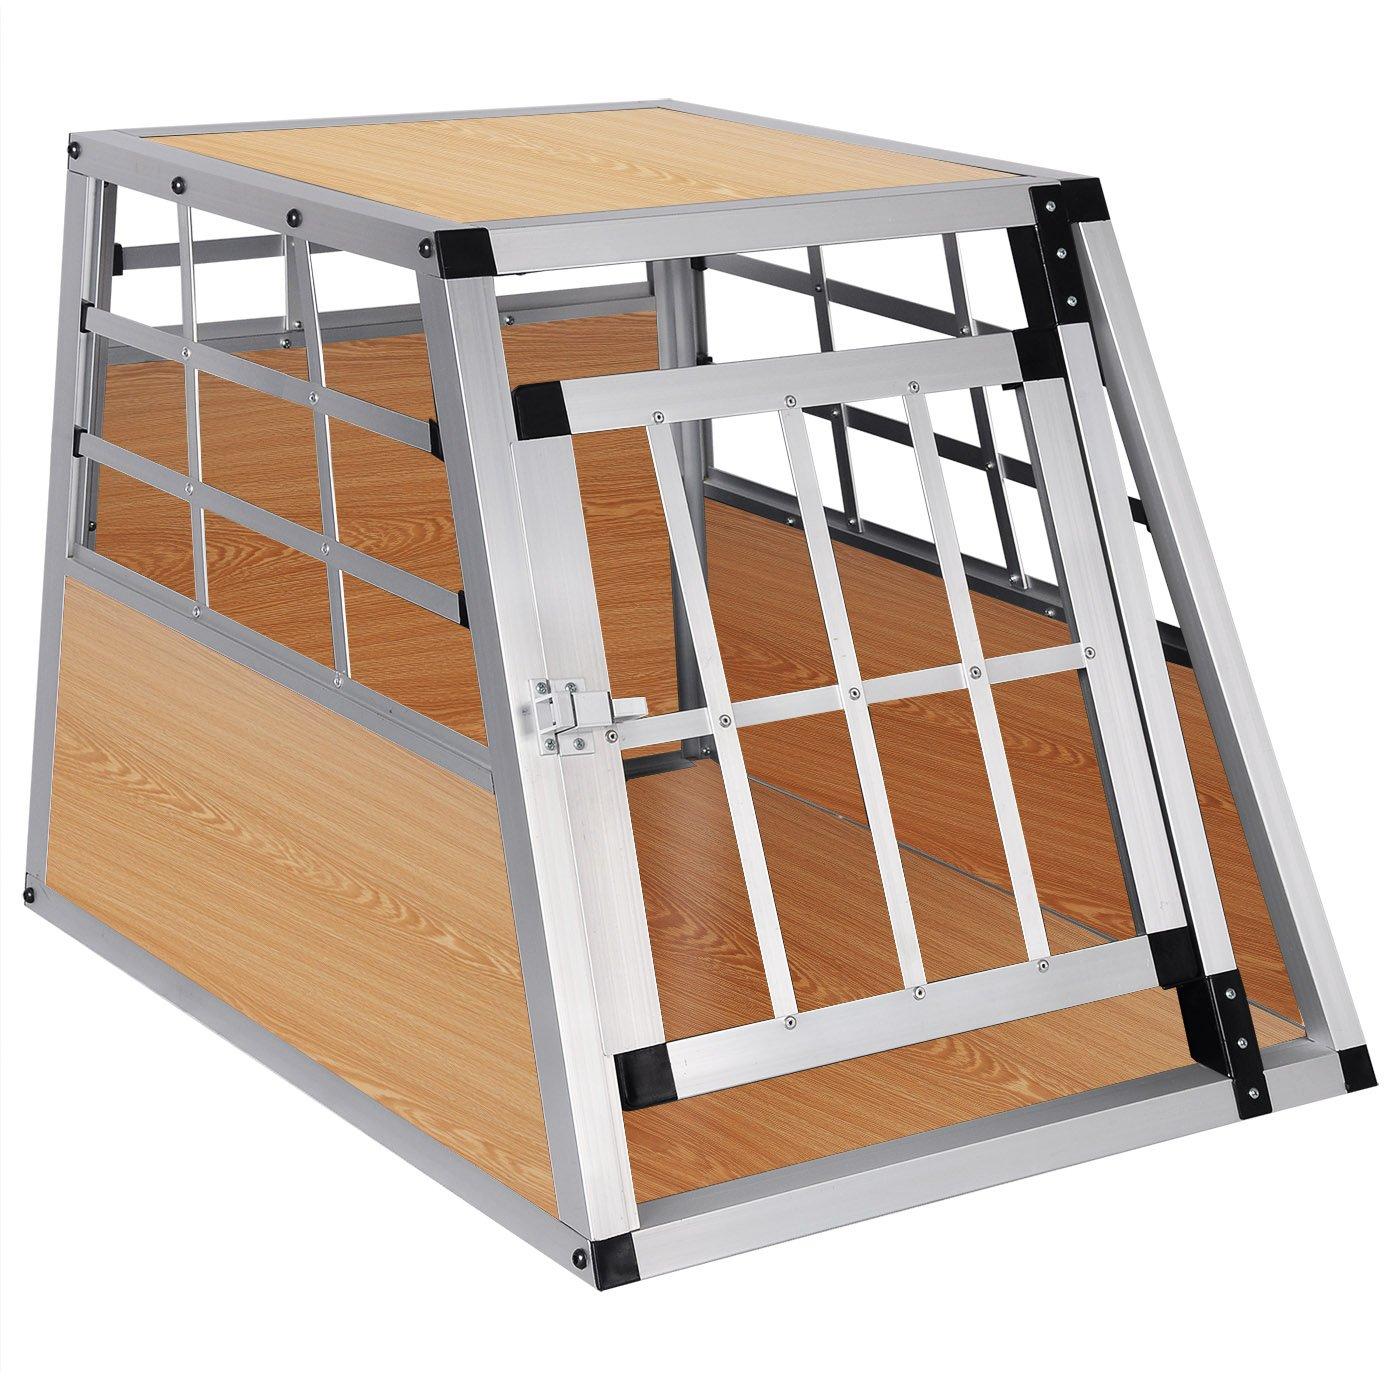 EUGAD Hundebox Transportbox Hundetransportbox Aluminium 1 Tü rig Reisebox Gitterbox Box Farbwahl EHT468